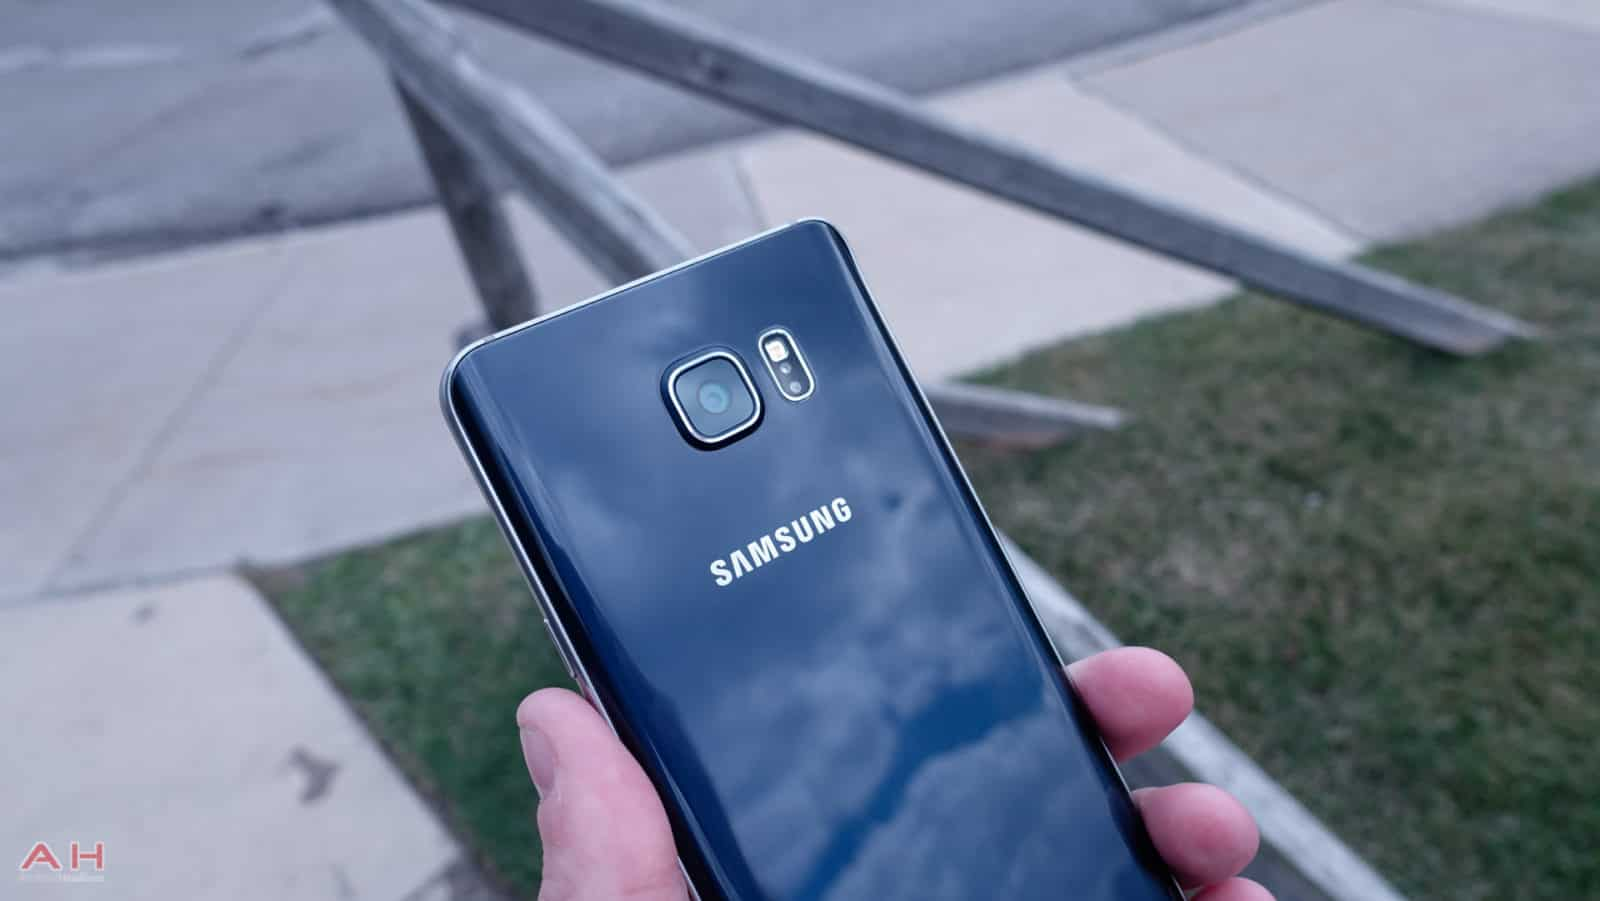 Samsung-Galaxy-Note-5-AH-3